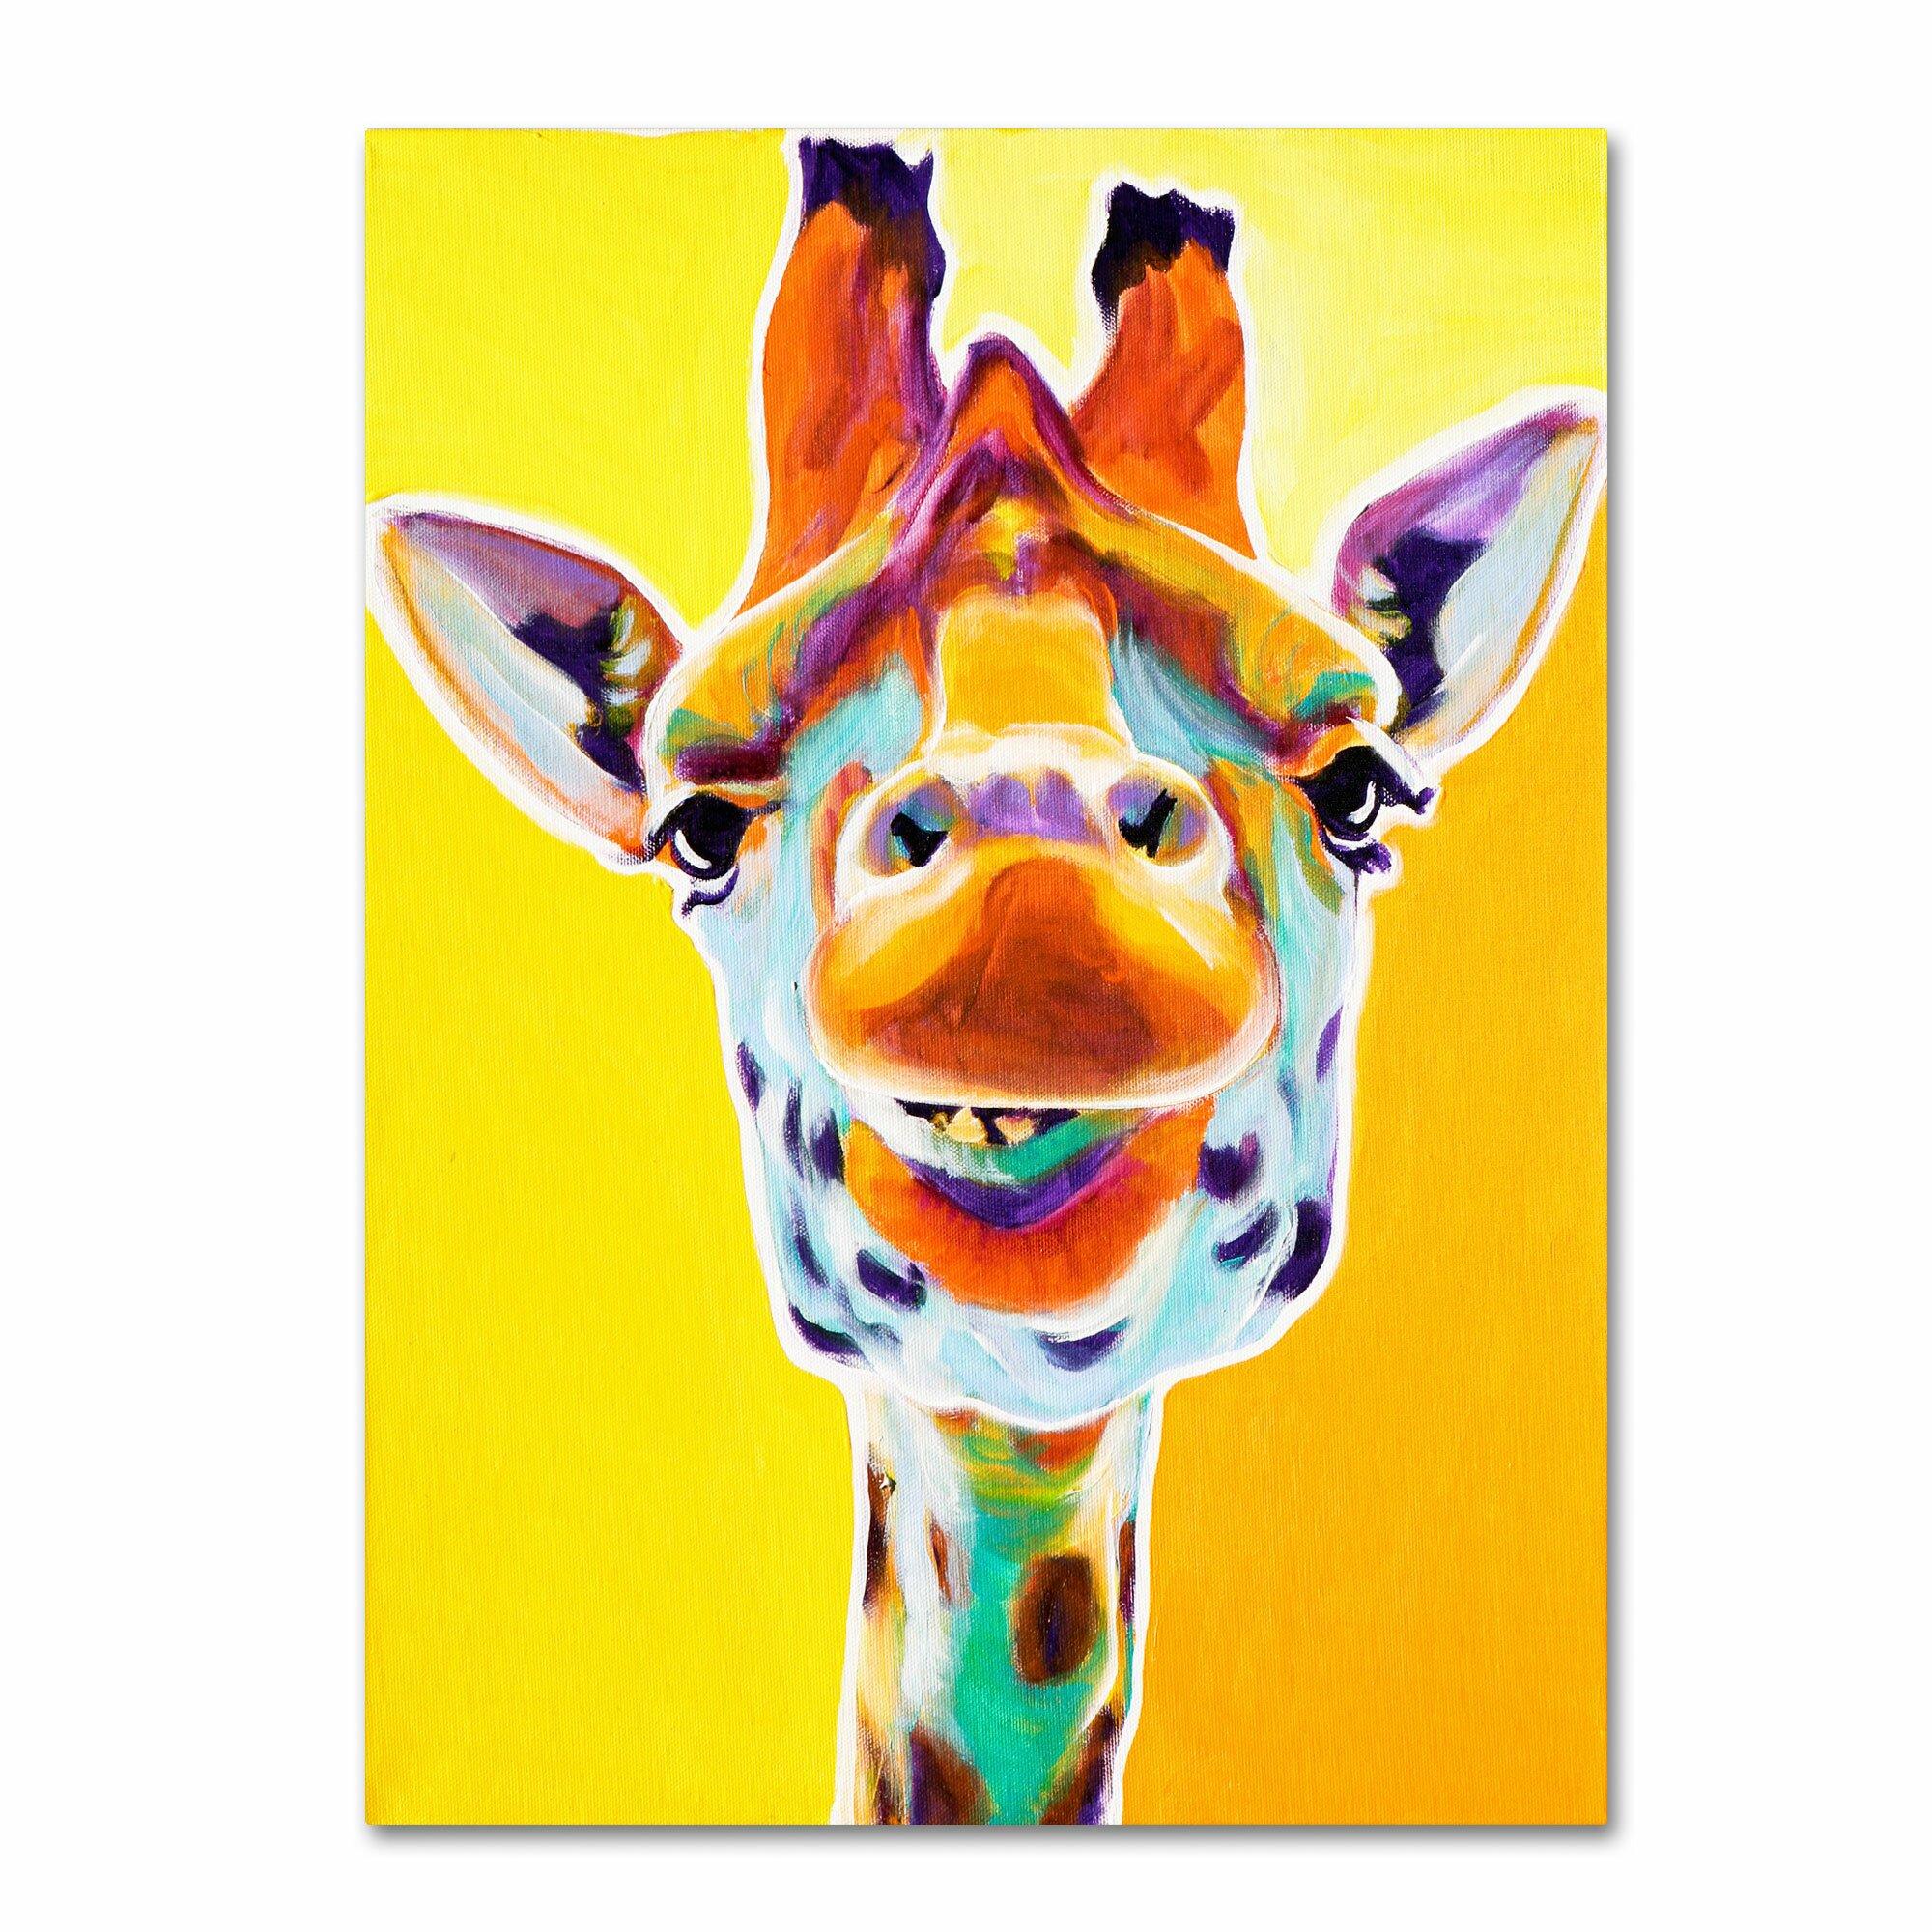 Trademark Art Quot Giraffe No 3 Quot By Dawgart Painting Print On